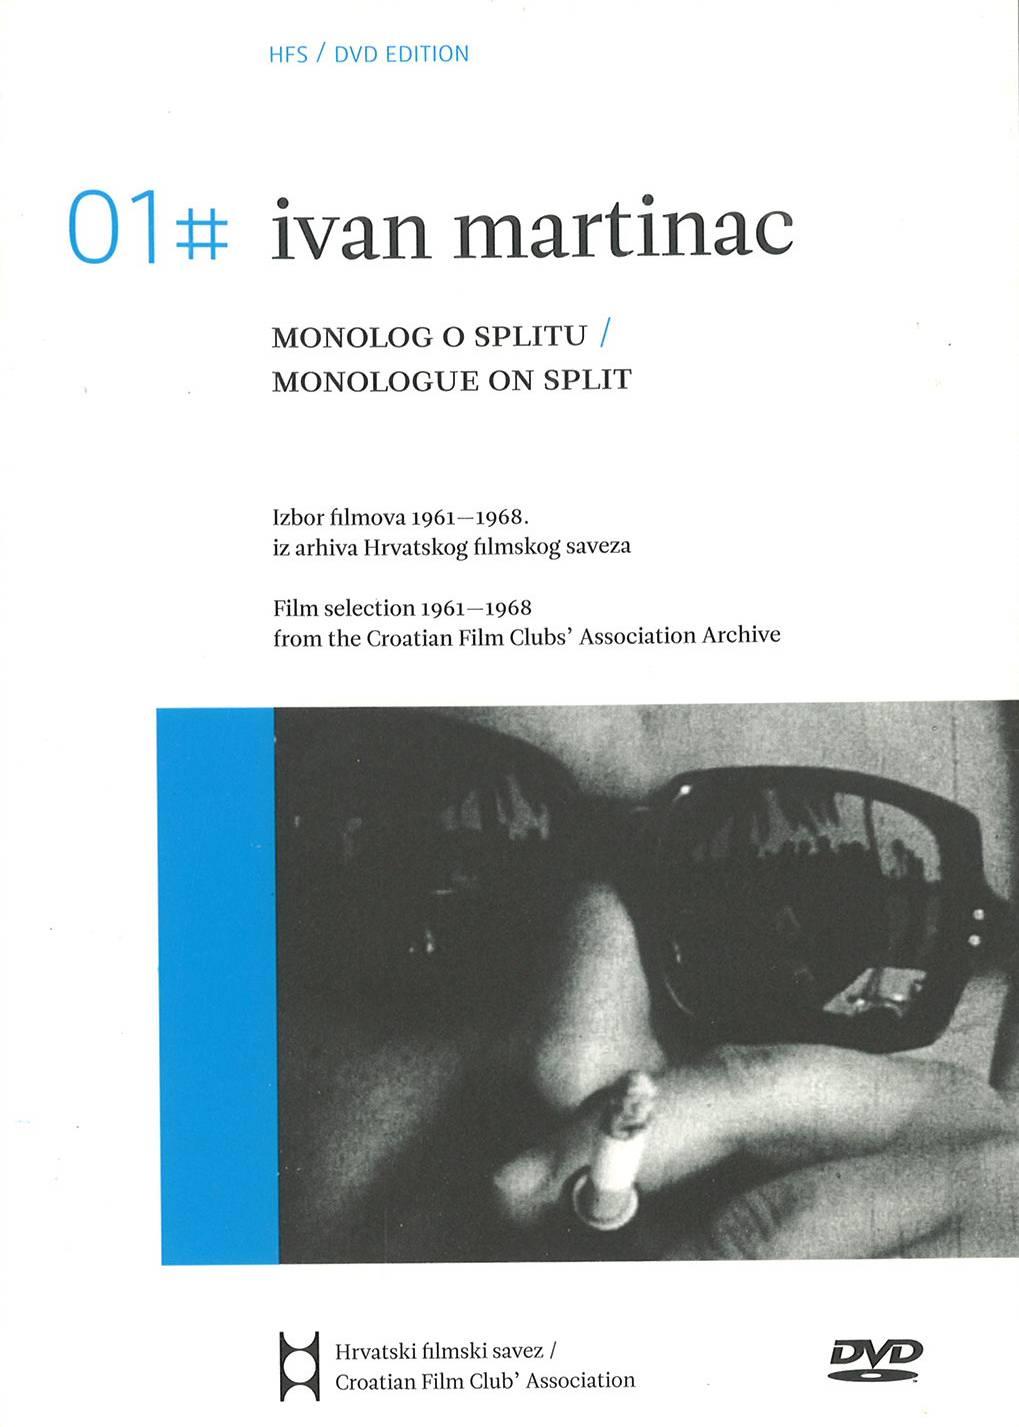 Ivan Martinac - Monolog o Splitu DVD (HFS, 2007.)